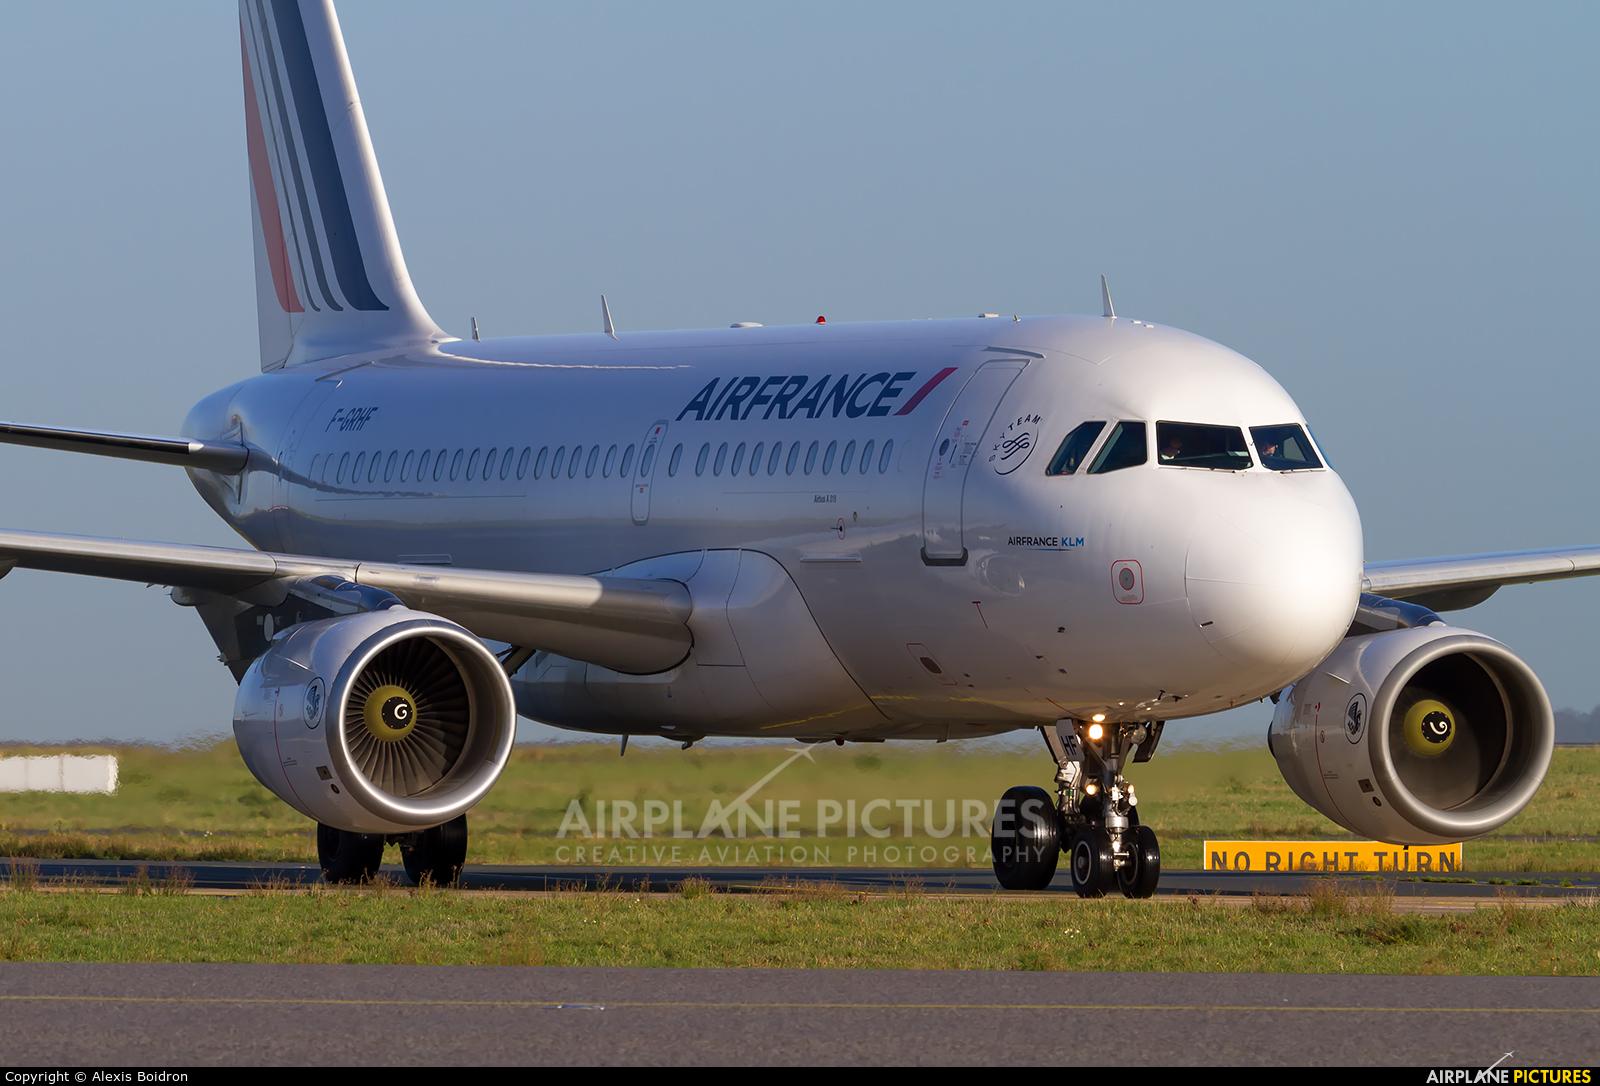 Air France F-GRHF aircraft at Paris - Charles de Gaulle